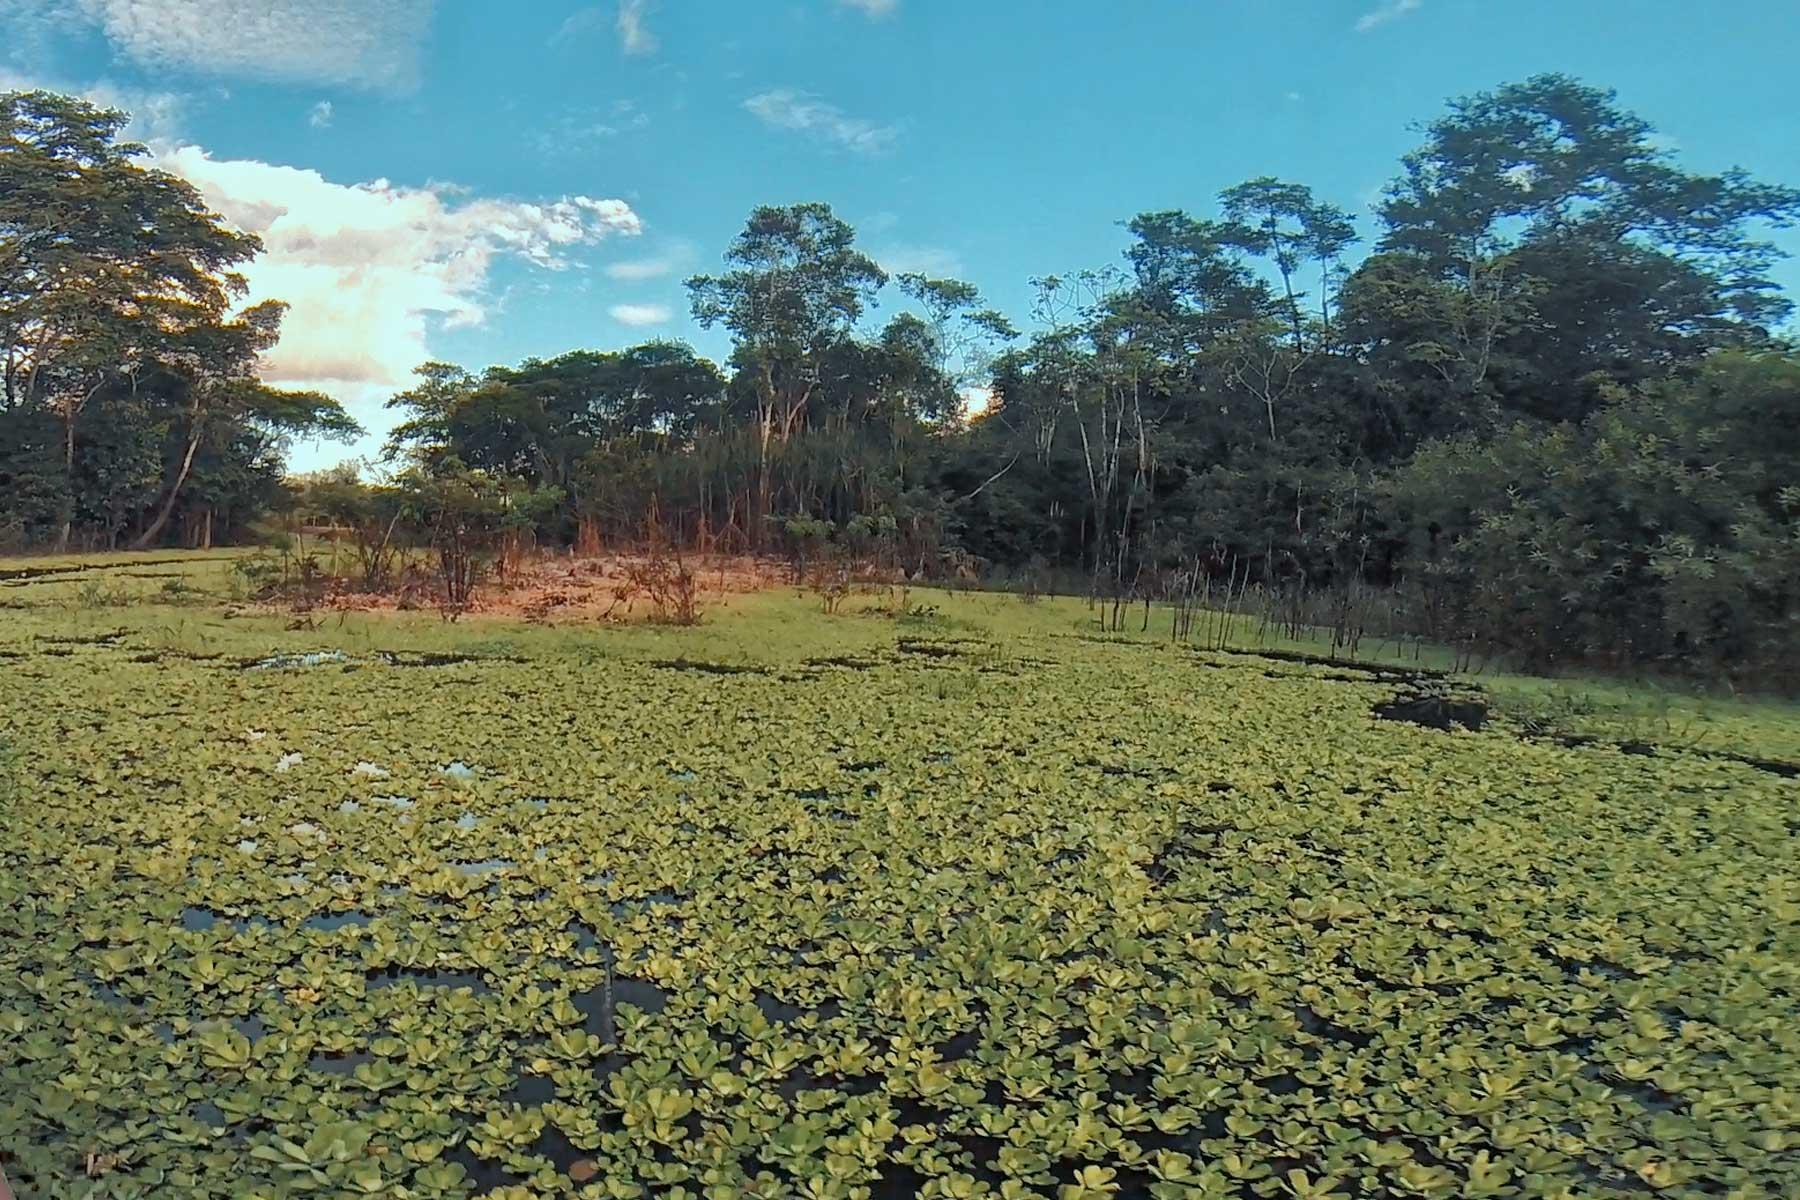 viaje al amazonas iquitos